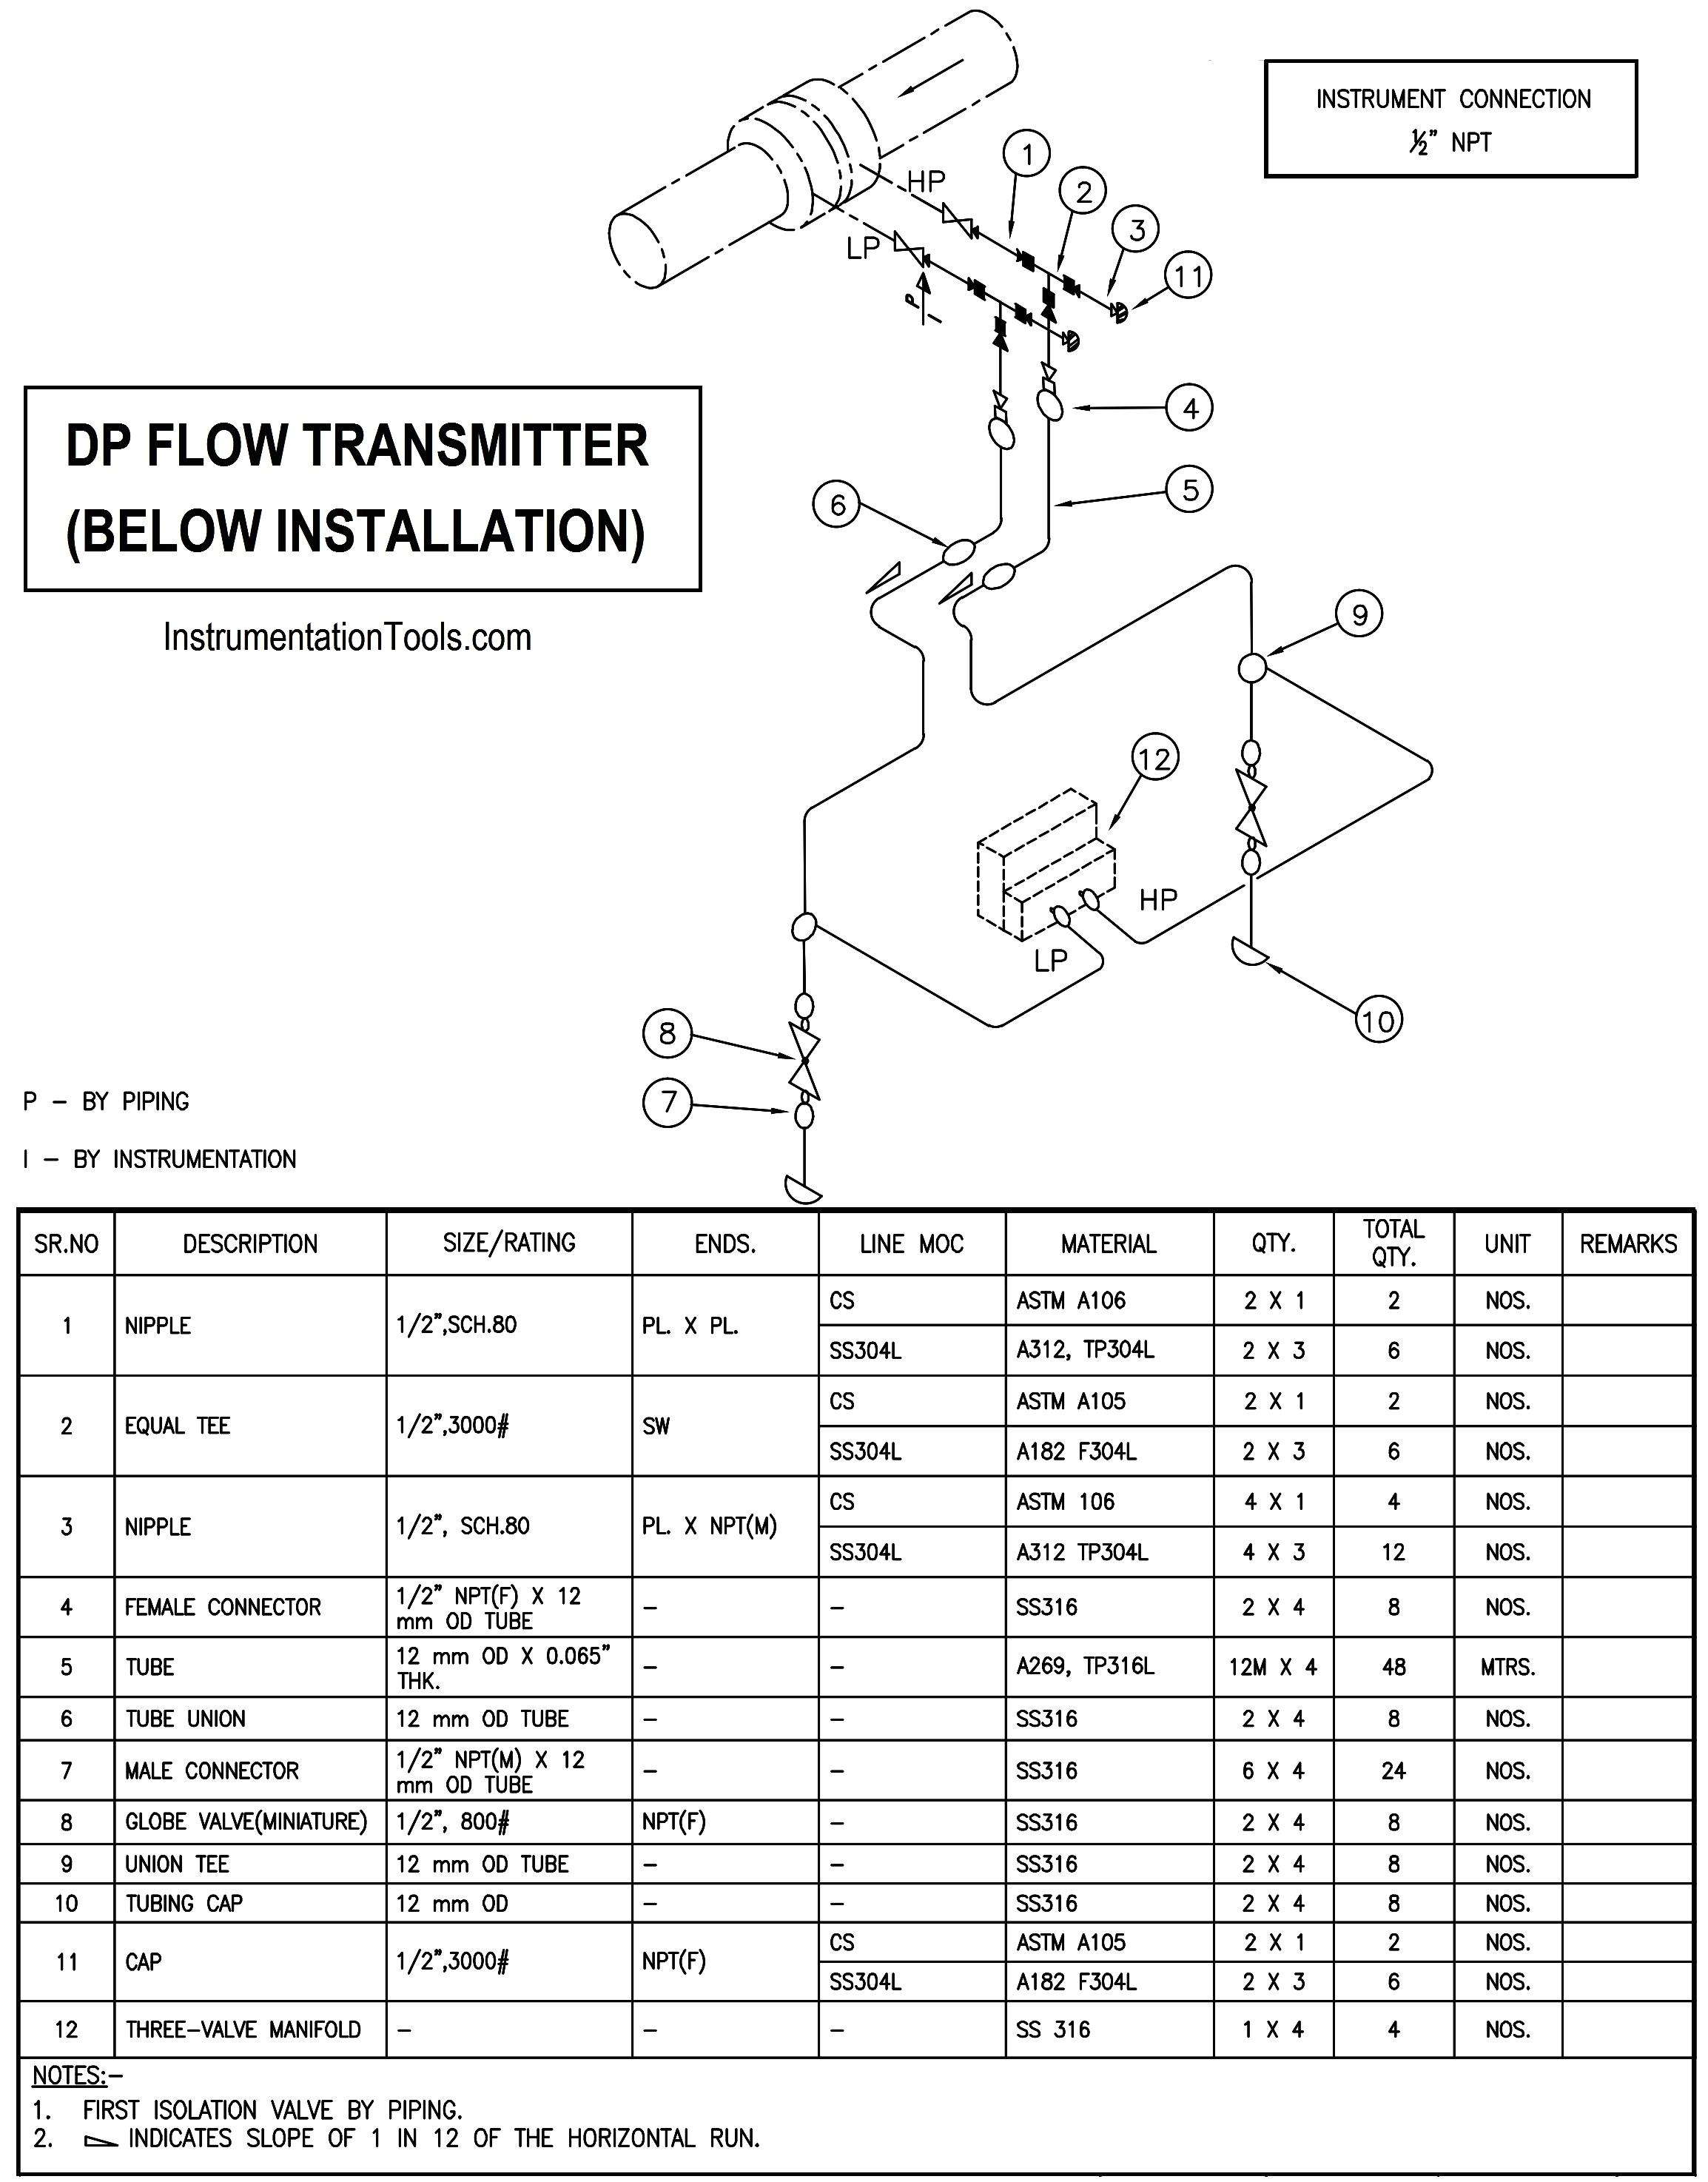 instrument hook up diagram for differential pressure transmitter